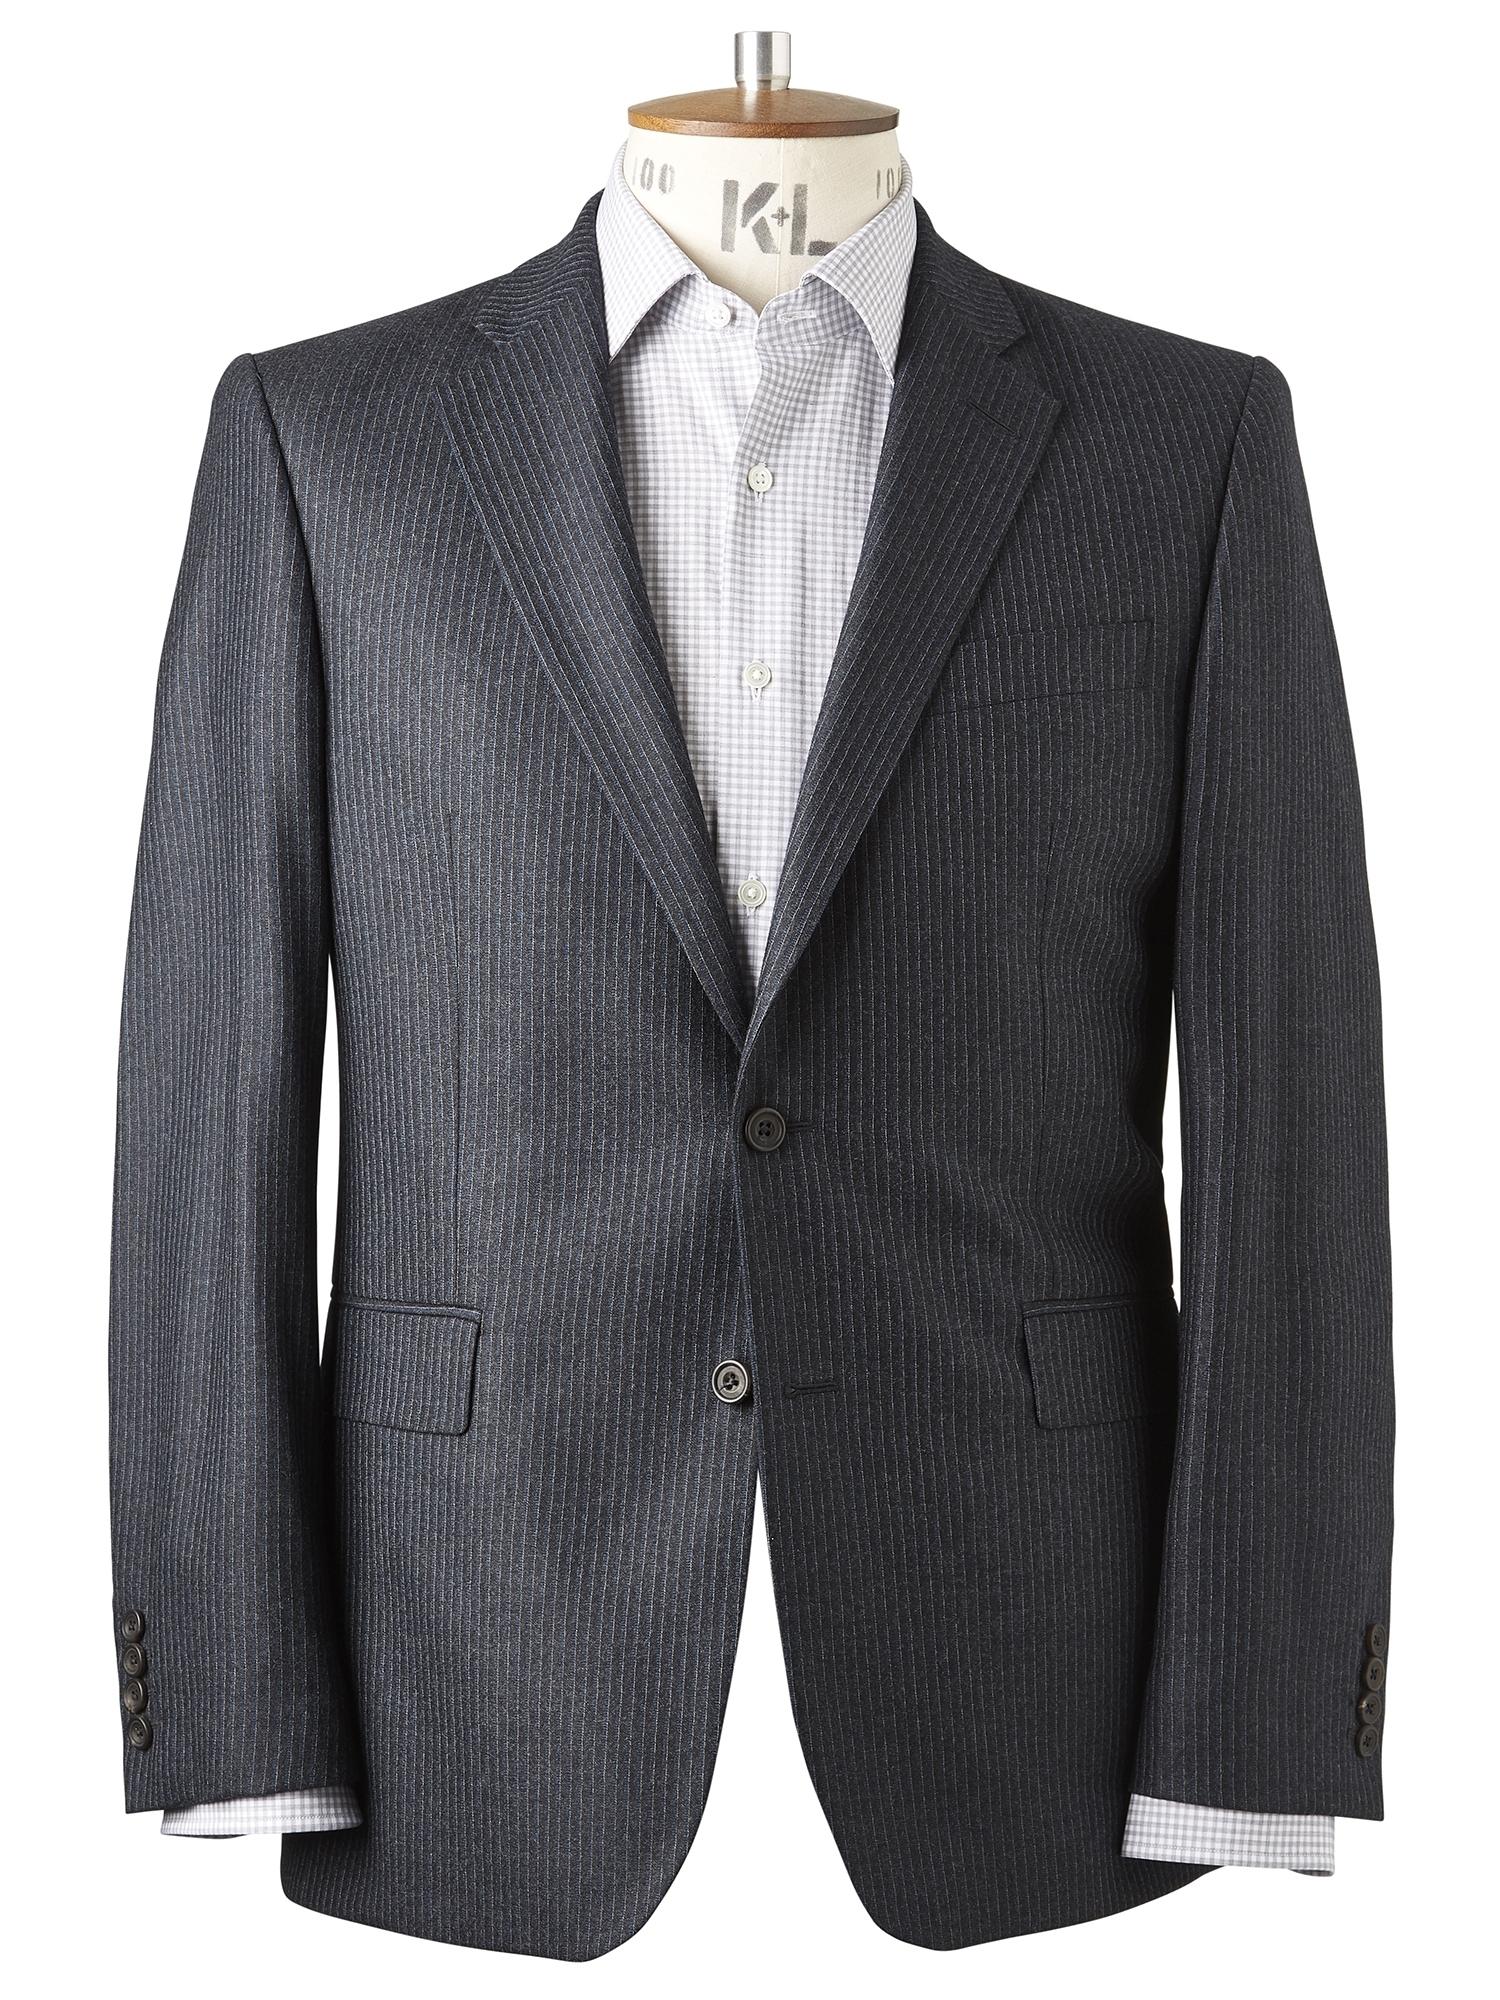 CHESTER BARRIE Narrow Pinstripe Berkeley Suit